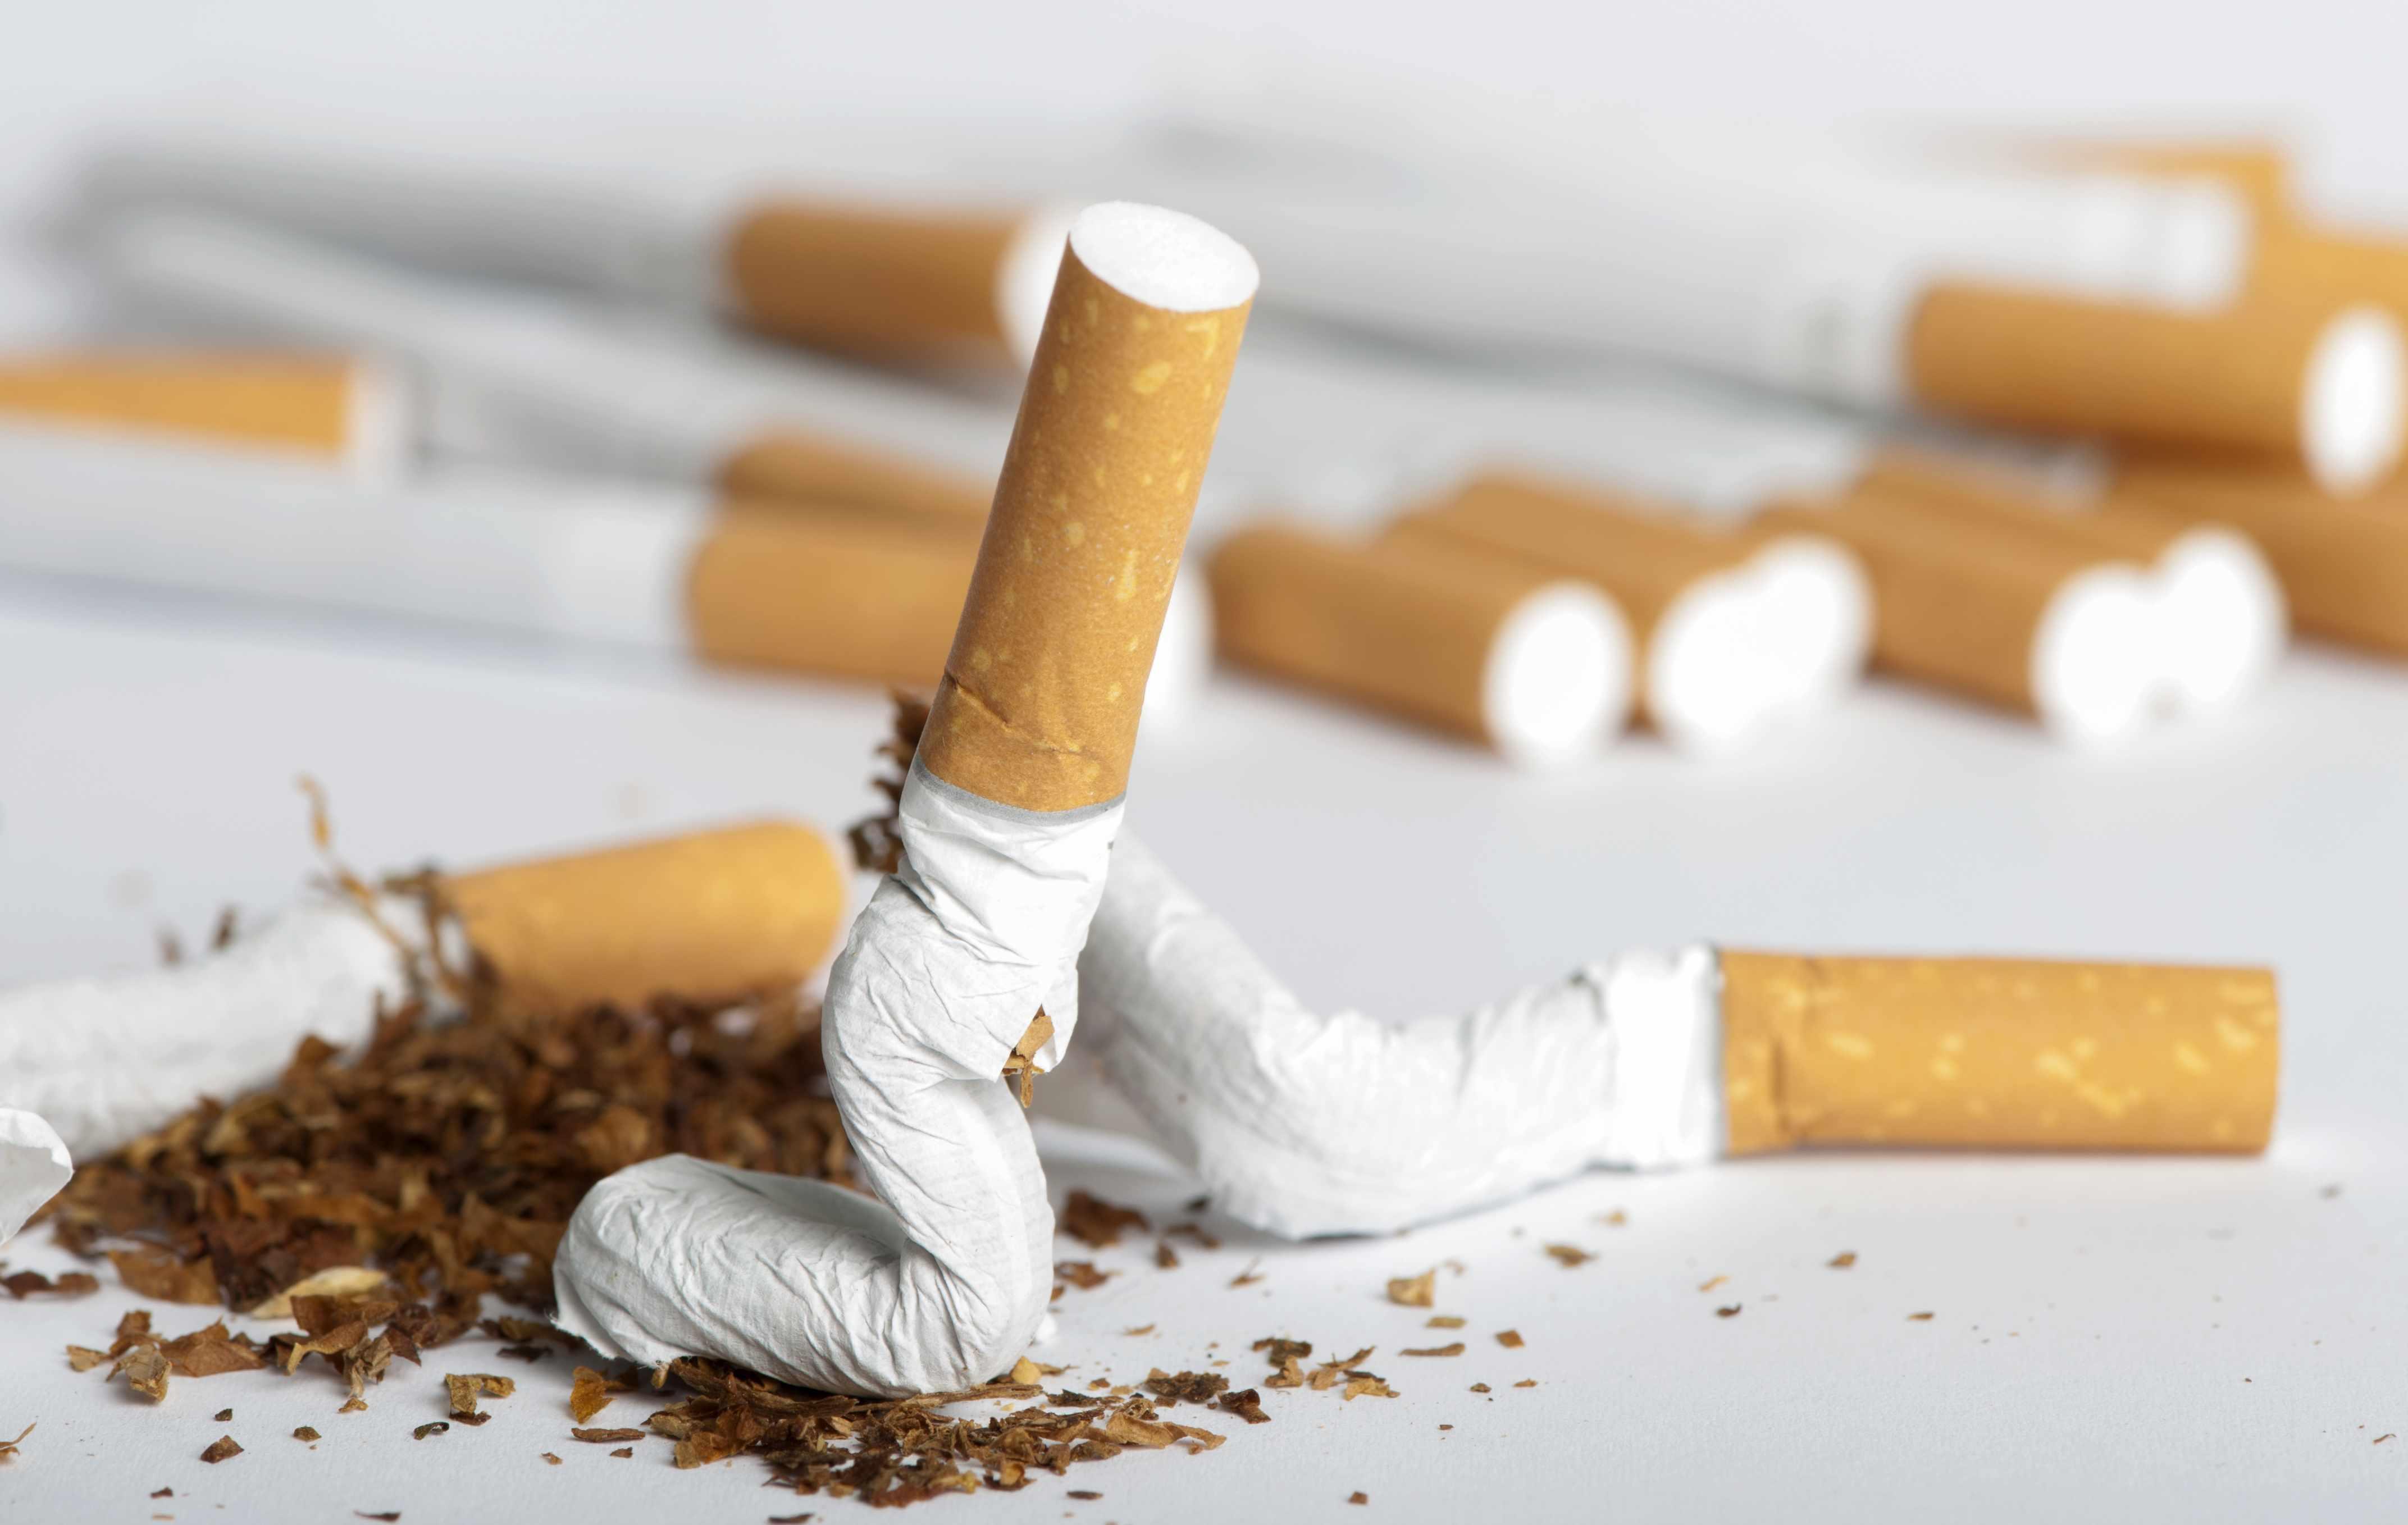 crumpled cigarette, smoking